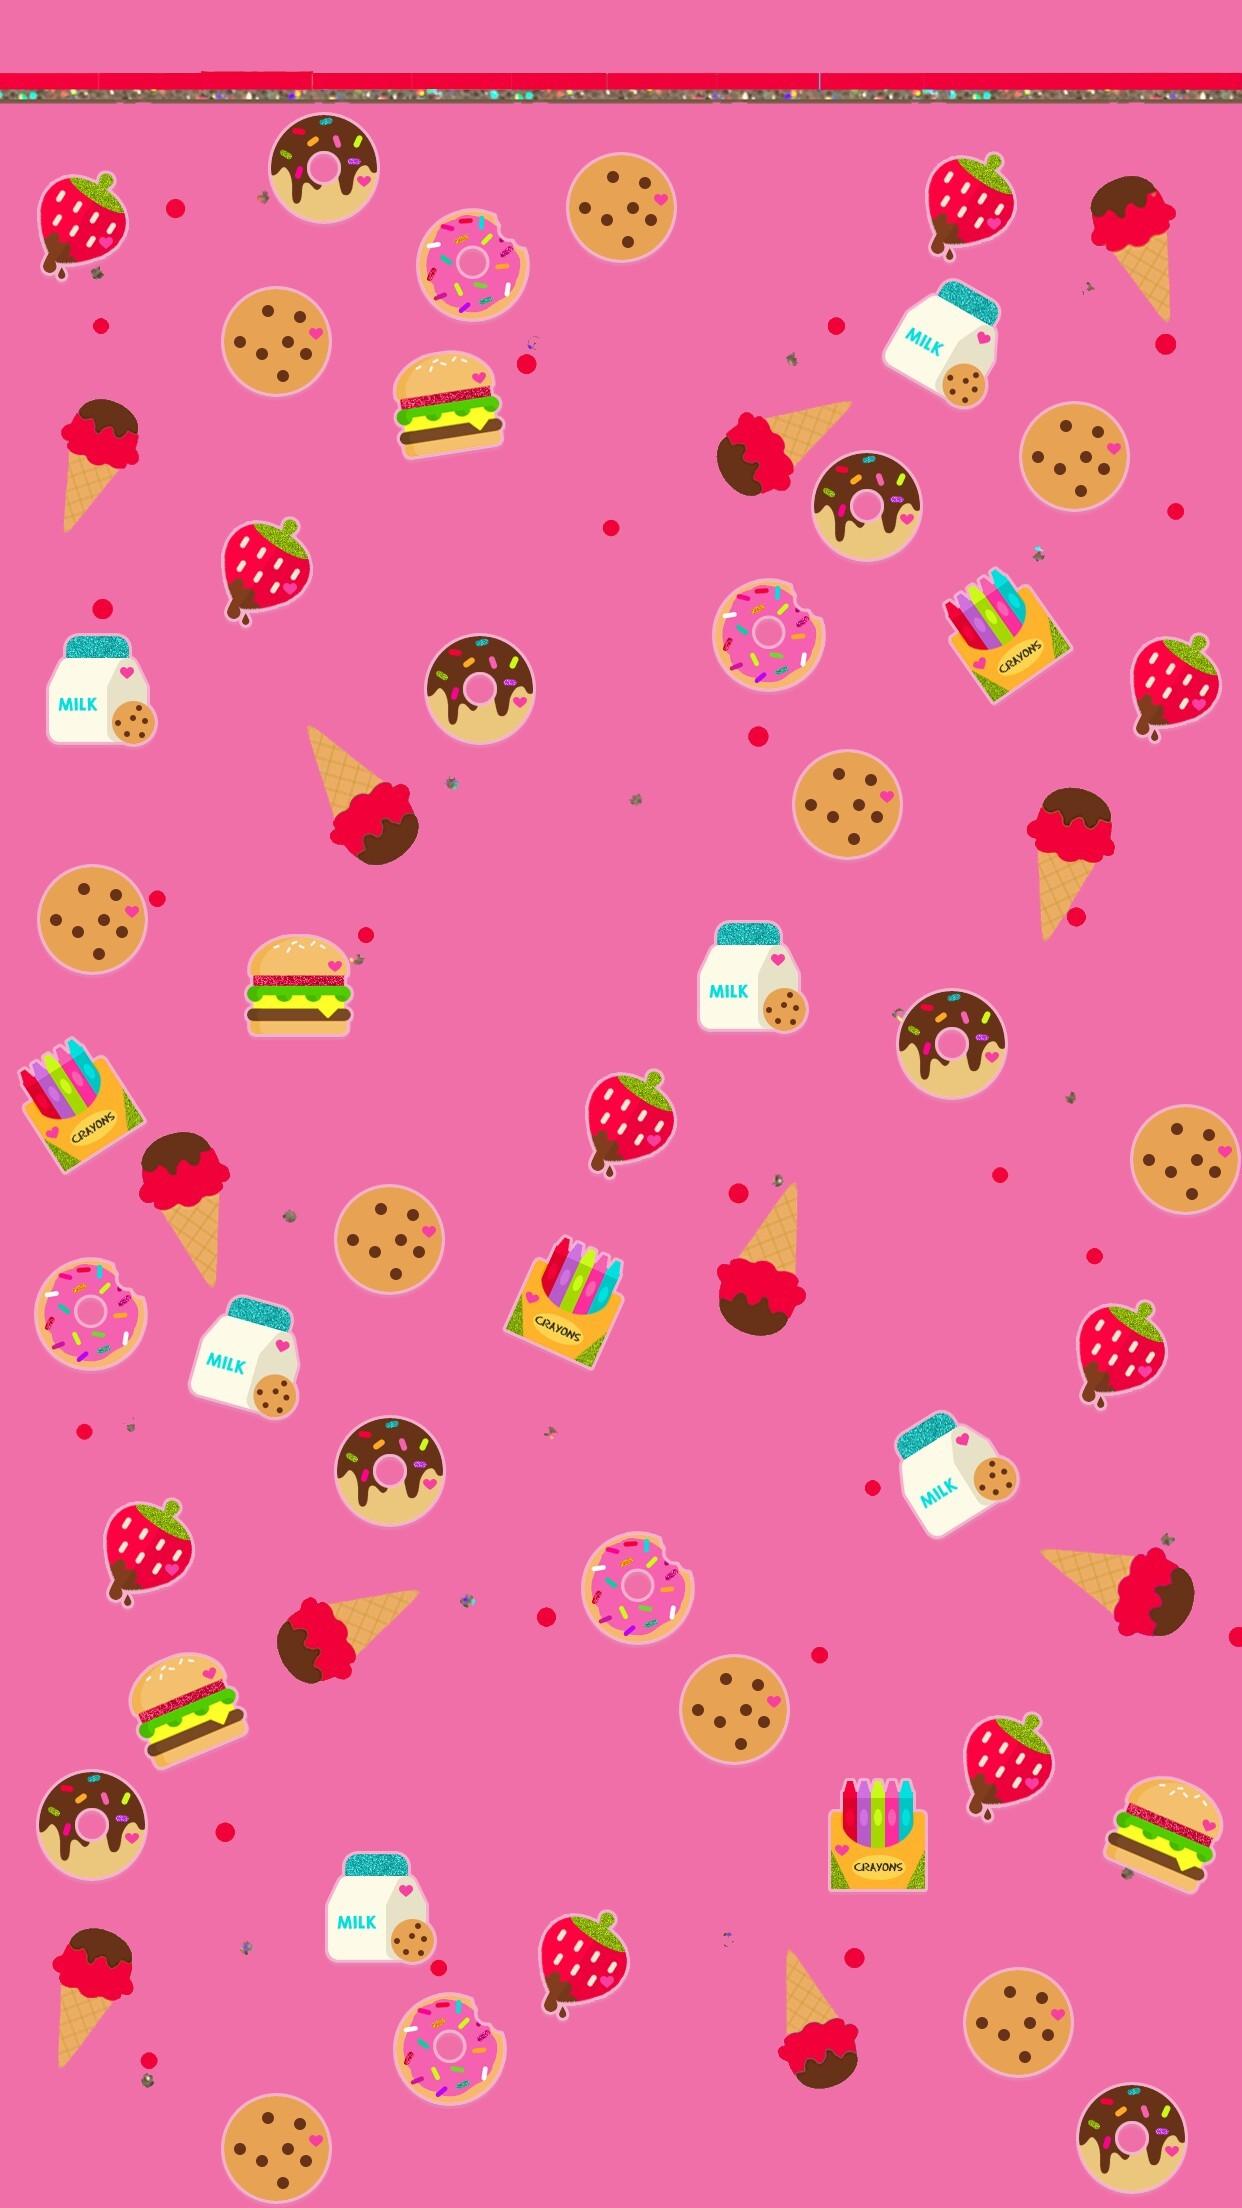 Pusheen Iphone Wallpaper Cute Kawaii Phone Wallpapers 83 Images